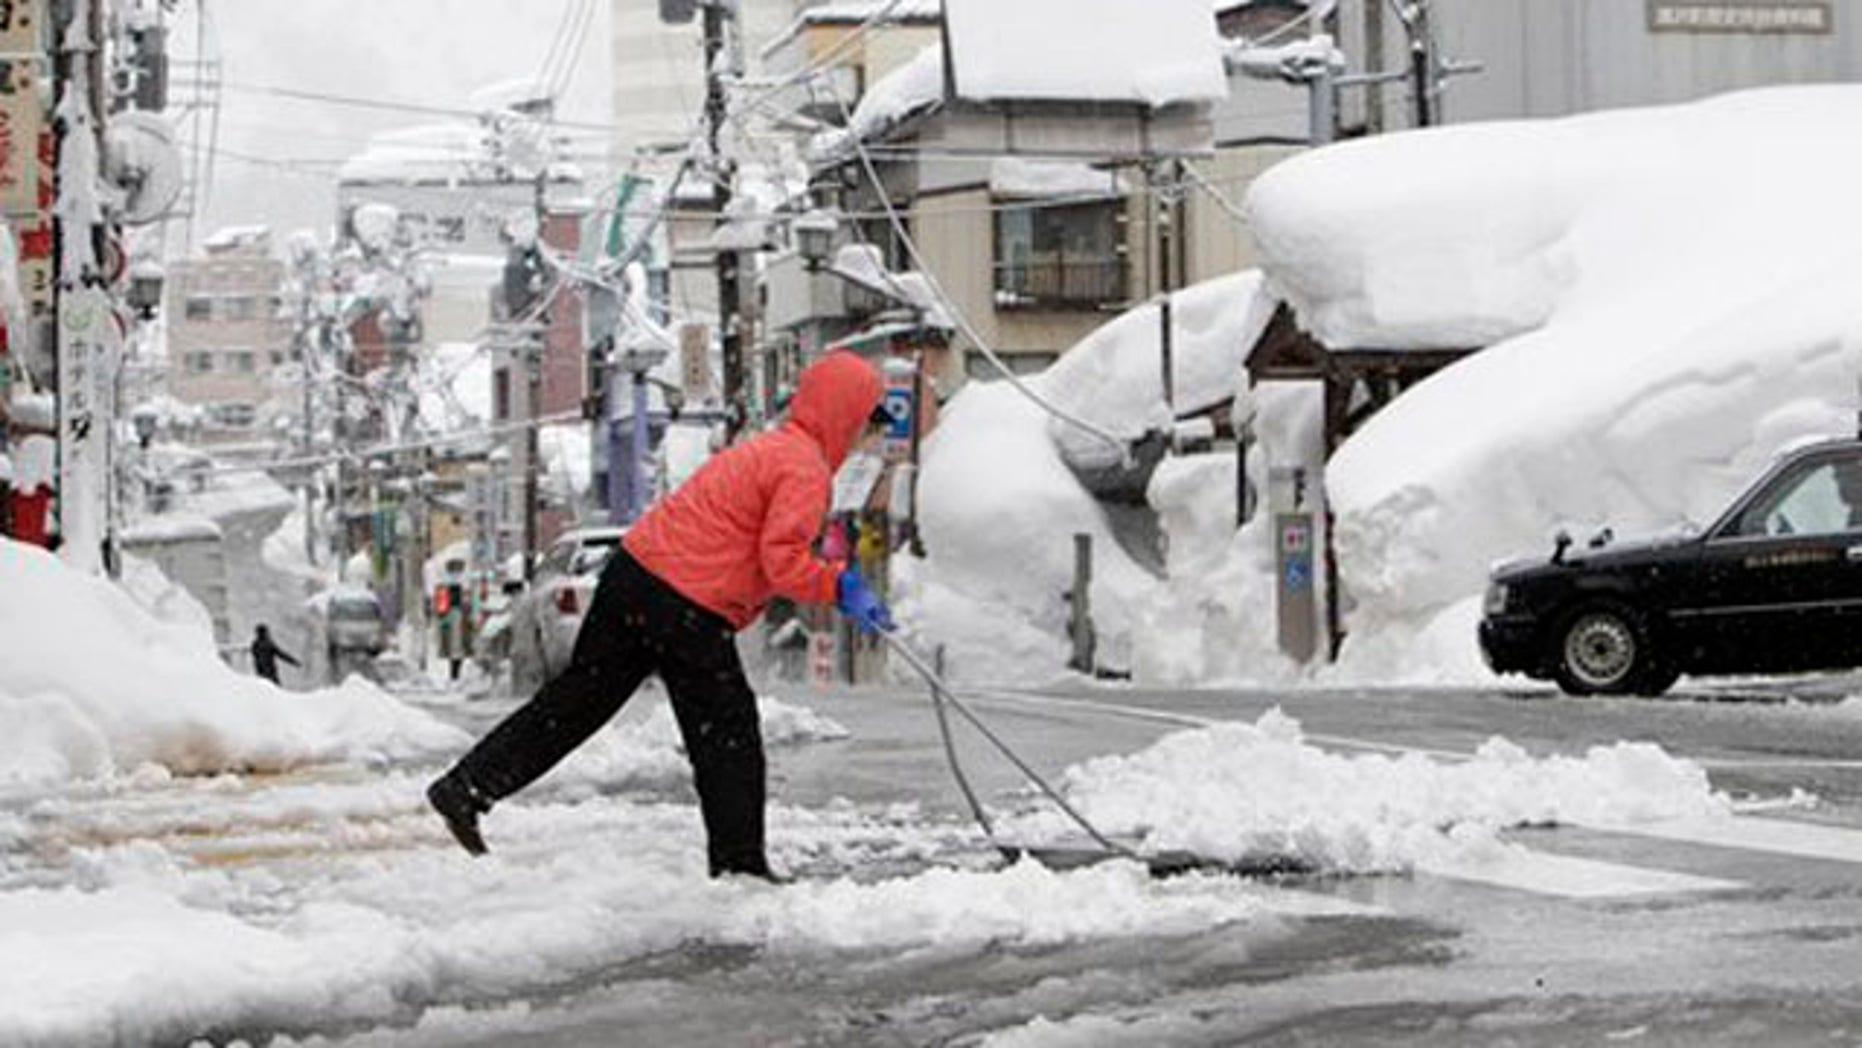 Feb. 1, 2012: A woman removes snow off a street in Yuzawa, Niigata prefecture, north of Tokyo.